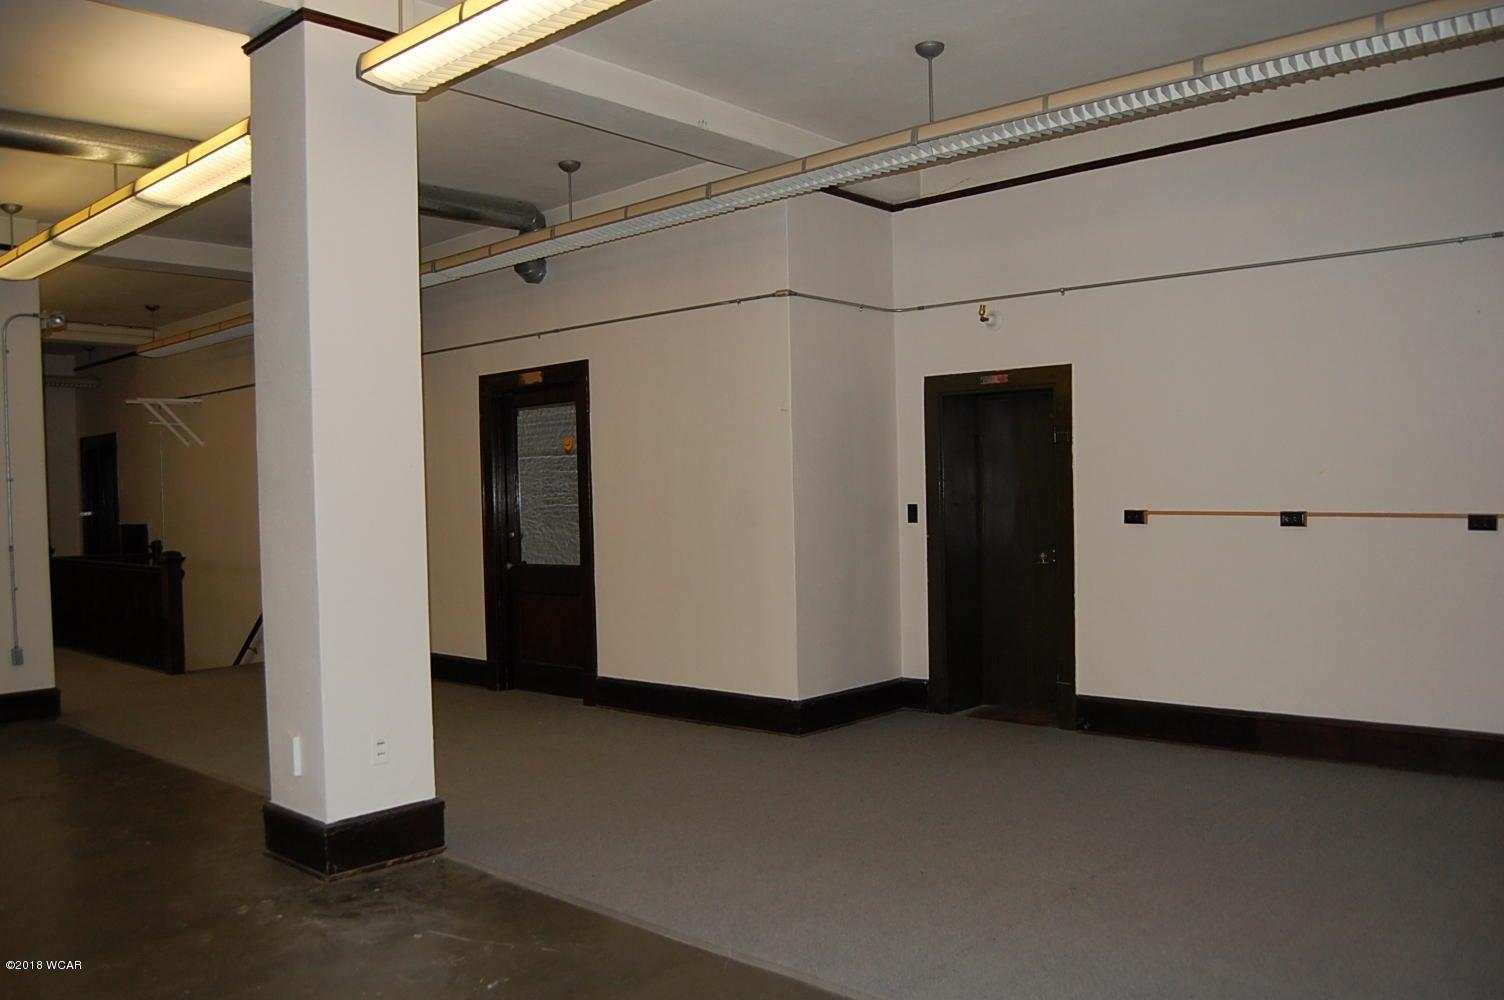 301 N 1st Street,Montevideo,Office,N 1st Street,6029308